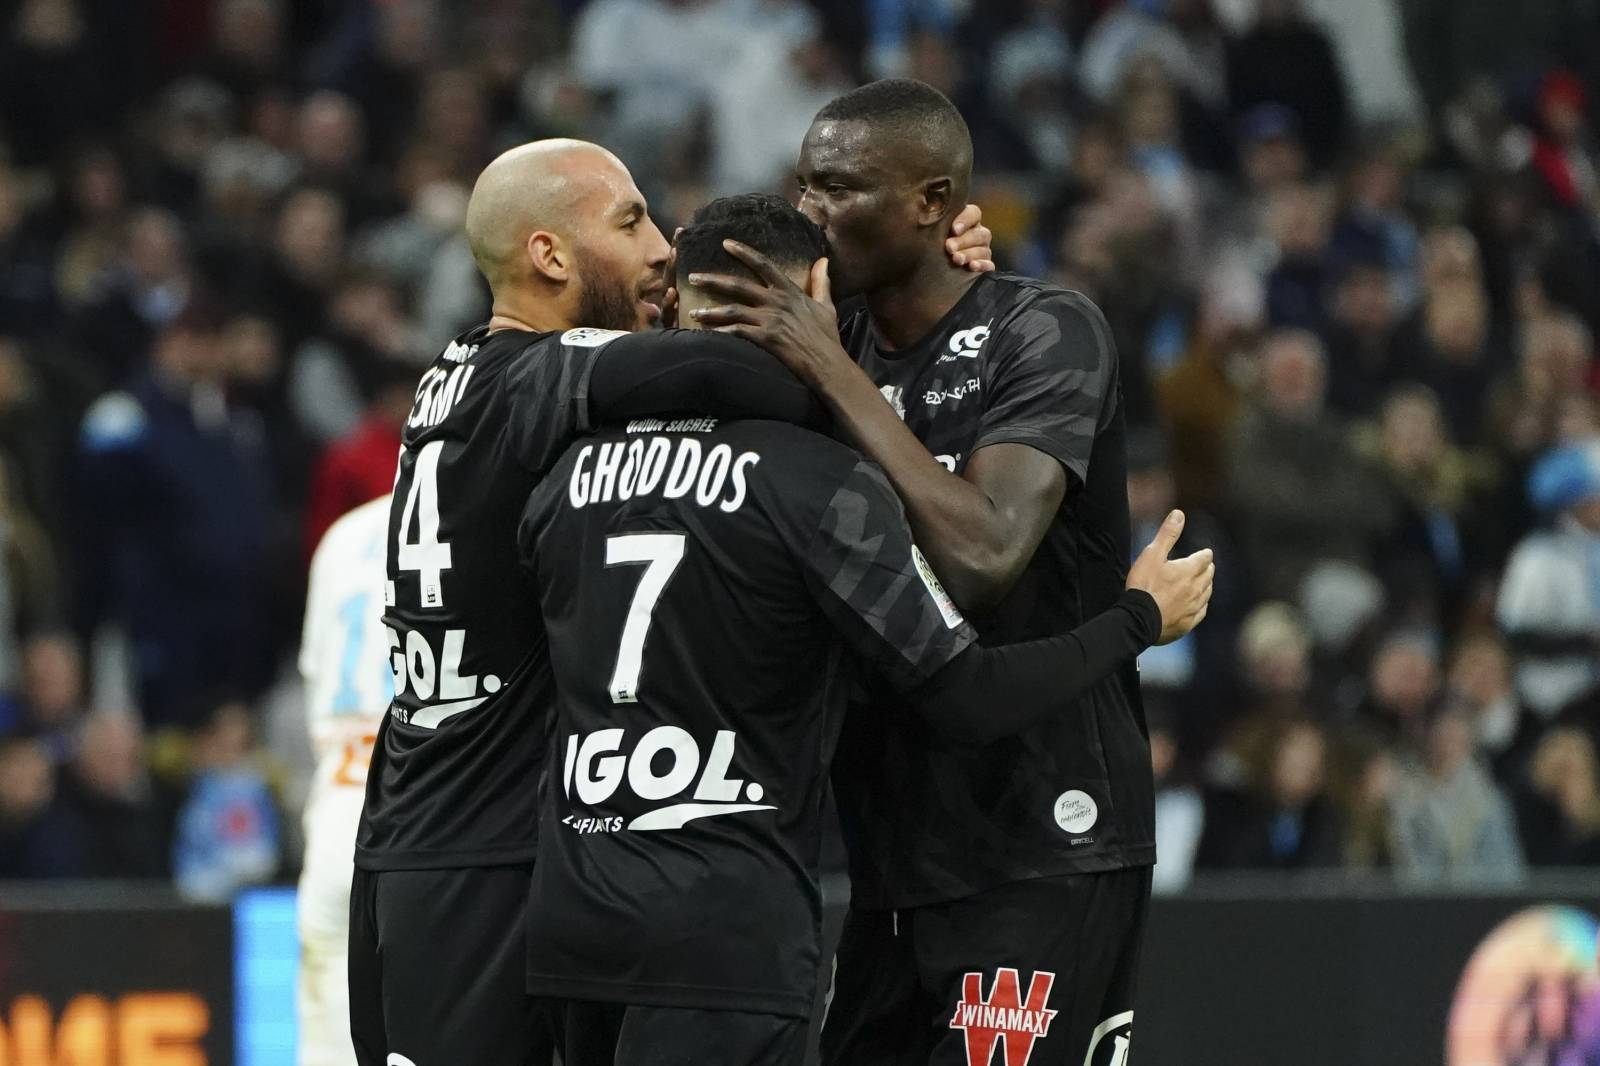 Match de championnat de Ligue 1 Conforama opposant l'Olympique de Marseille (OM) au Amiens Sporting Club (ASC) au stade vélofrome à Marseille